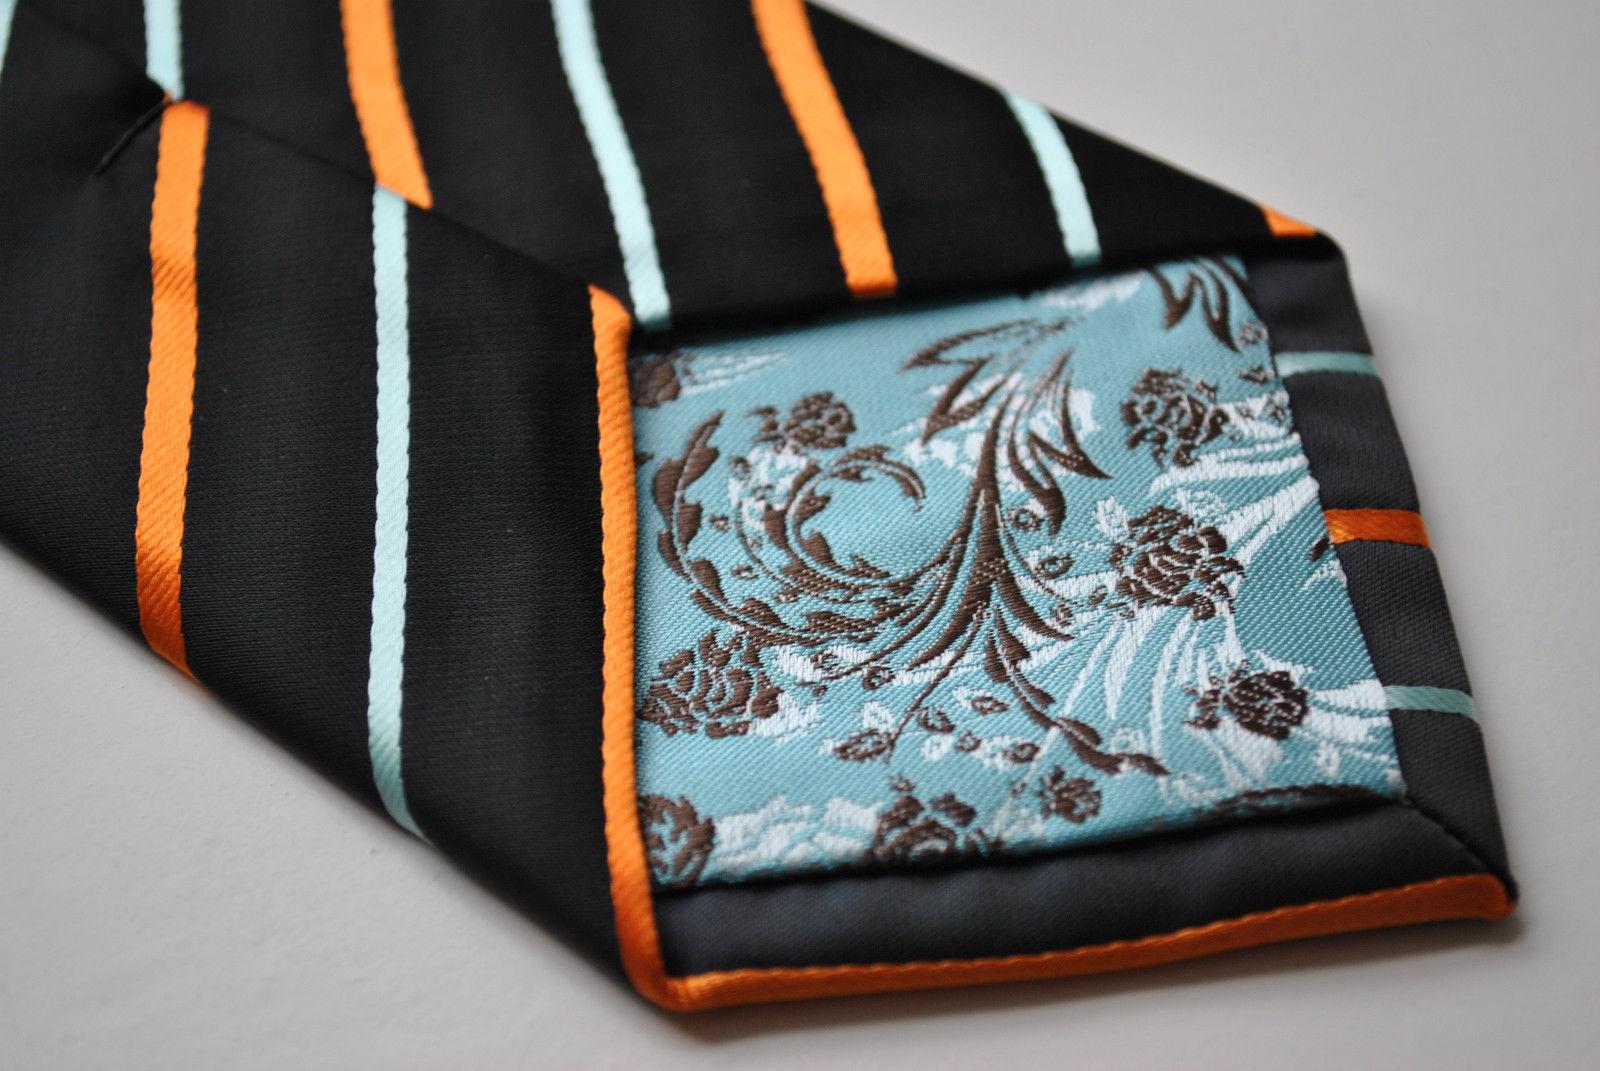 Frederick Thomas Designer Mens Tie - Black - Burnt Orange & Light Blue Striped